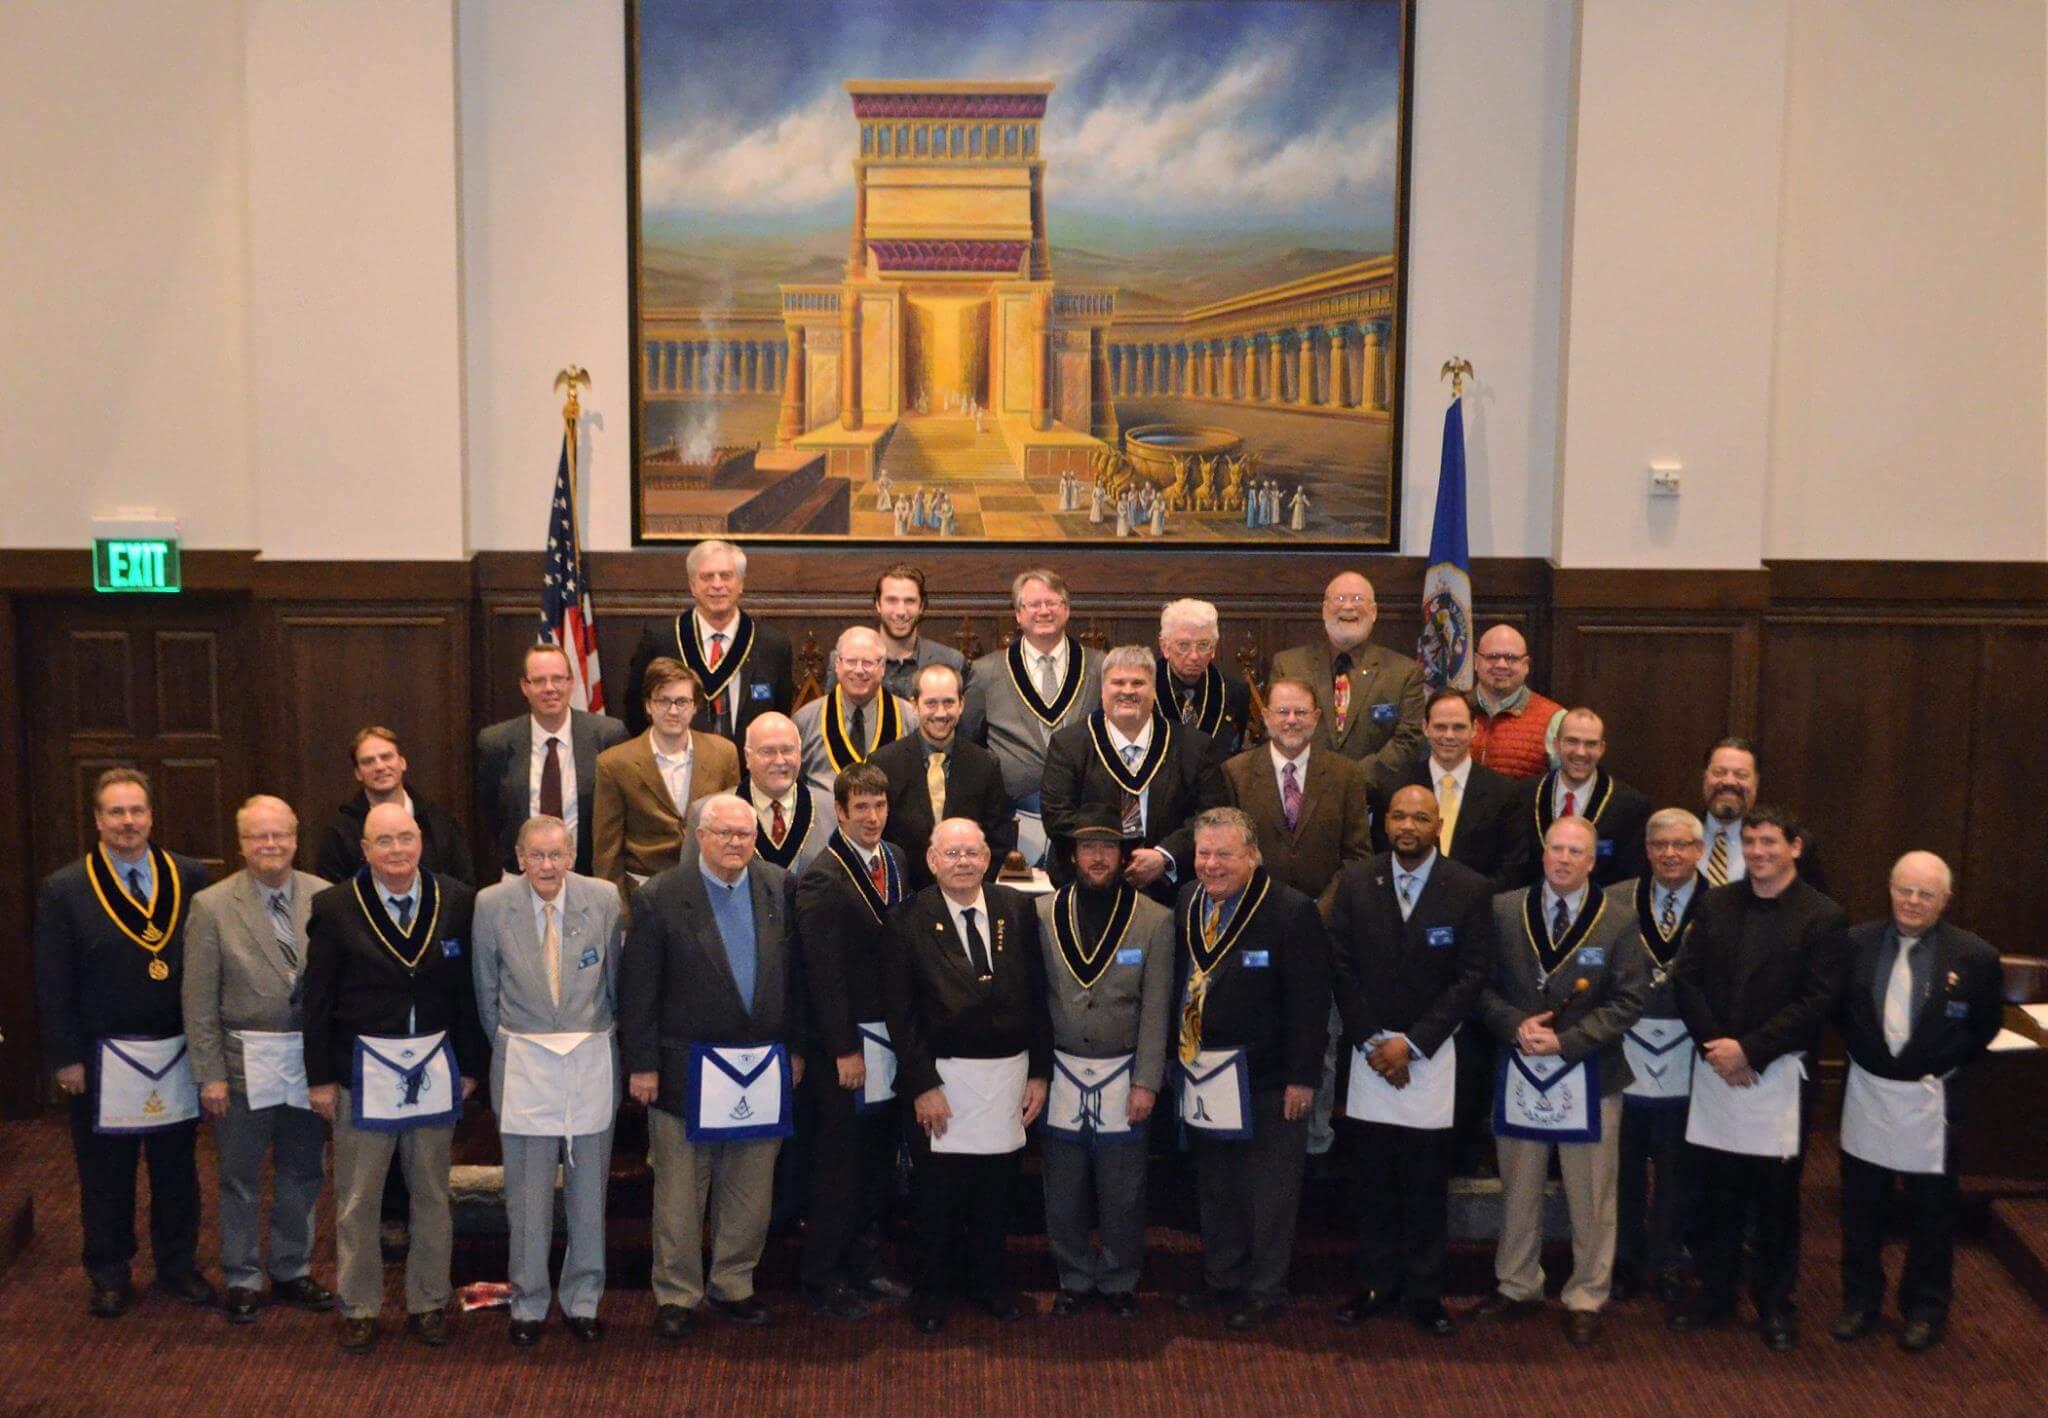 The Lodge Room Mn Masonic Heritage Center